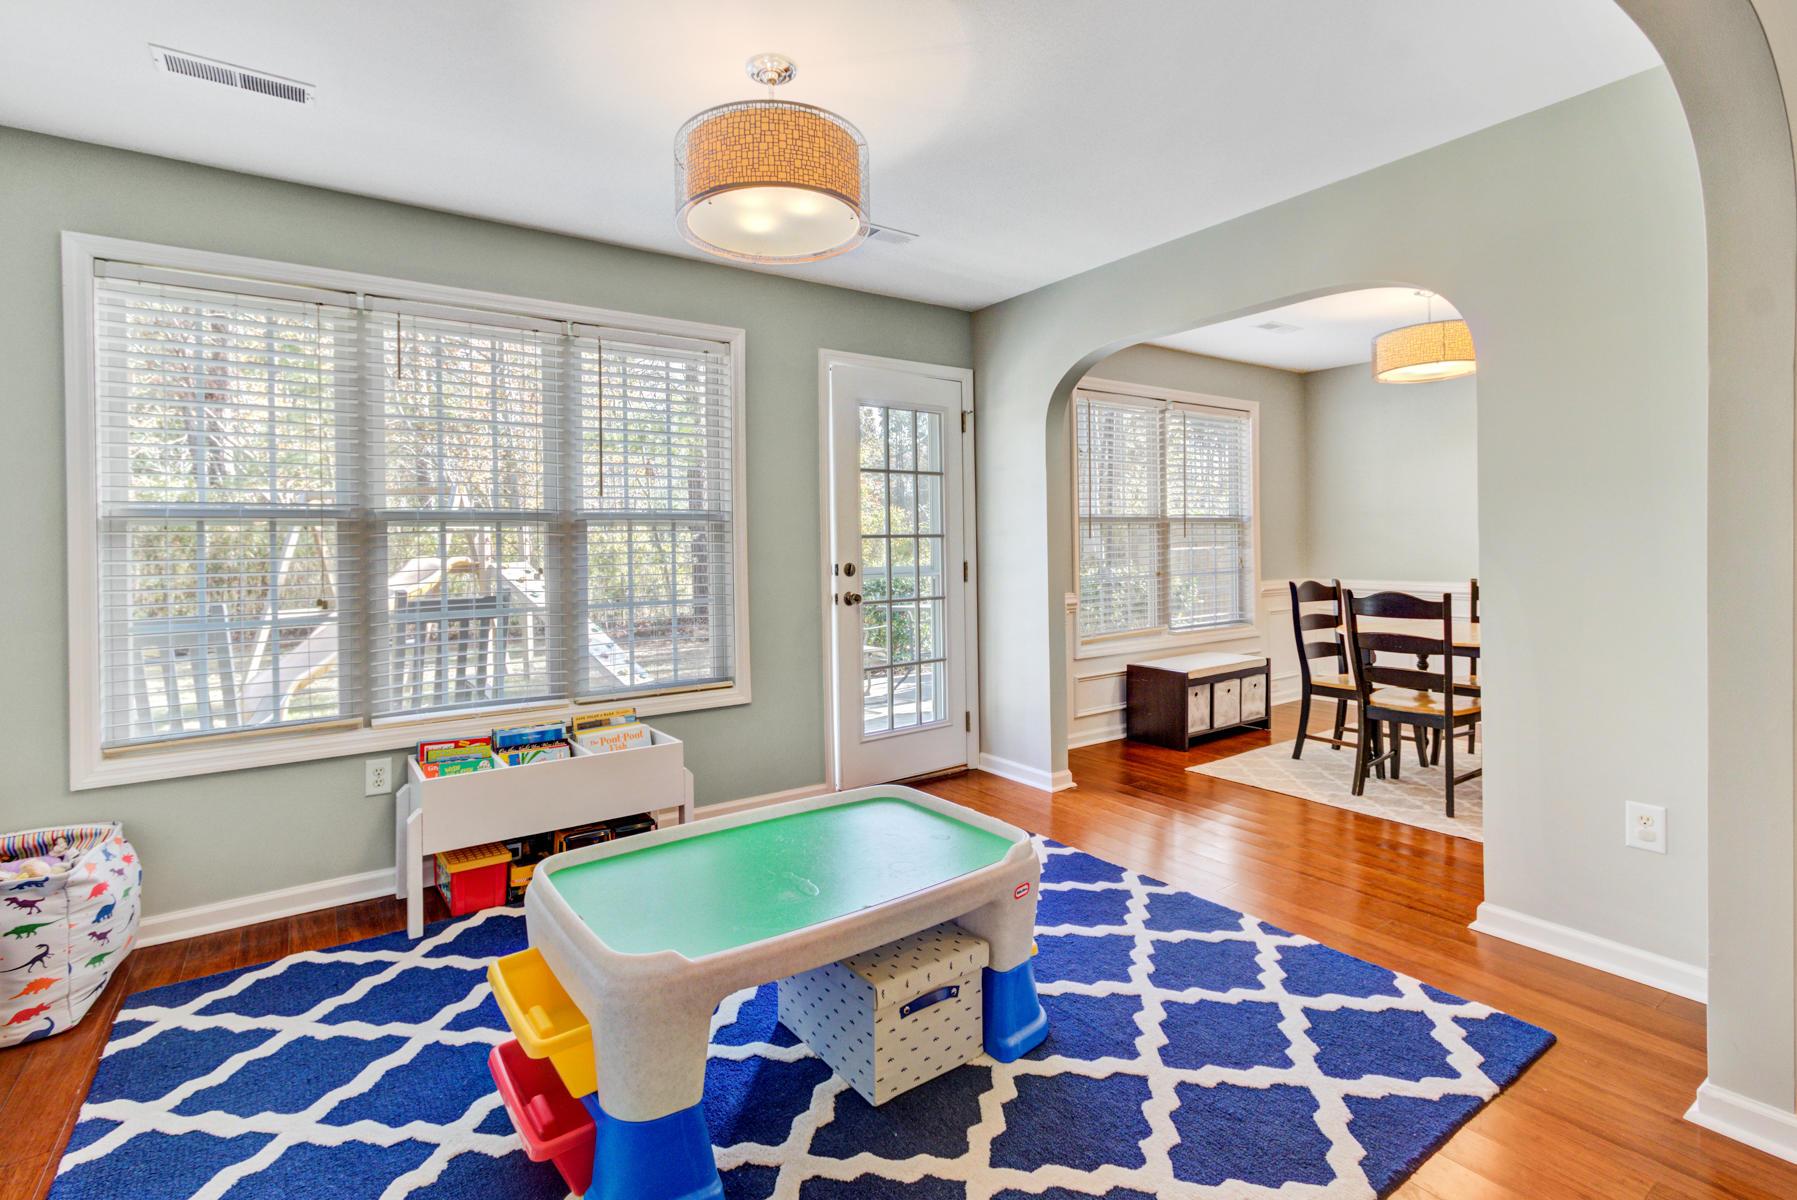 Park West Homes For Sale - 3444 Wellesley, Mount Pleasant, SC - 15